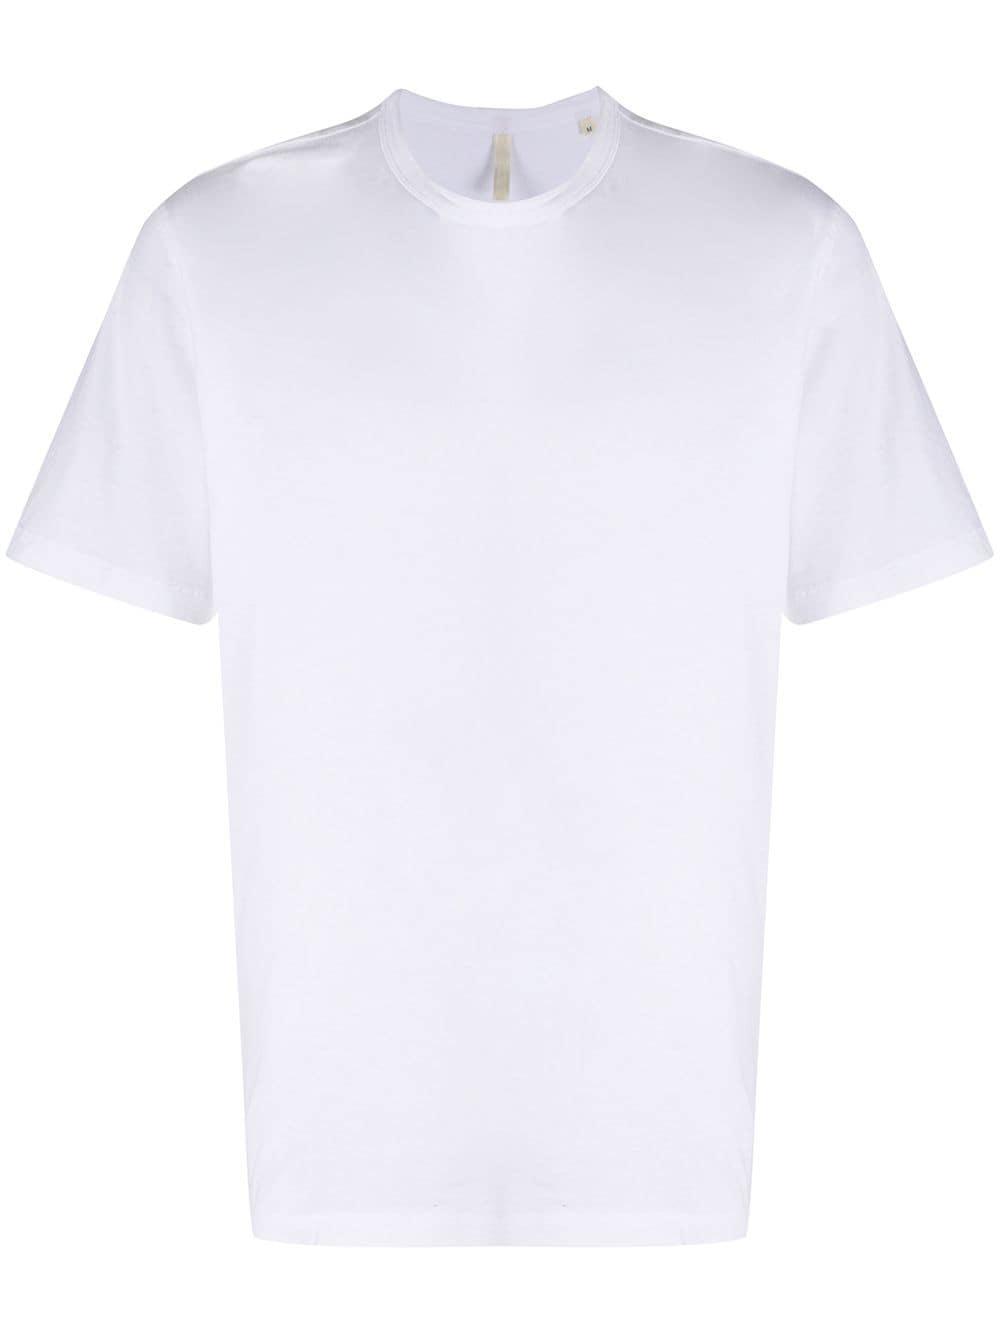 BASIC T-SHIRT SUNFLOWER | T-shirts | 2011001